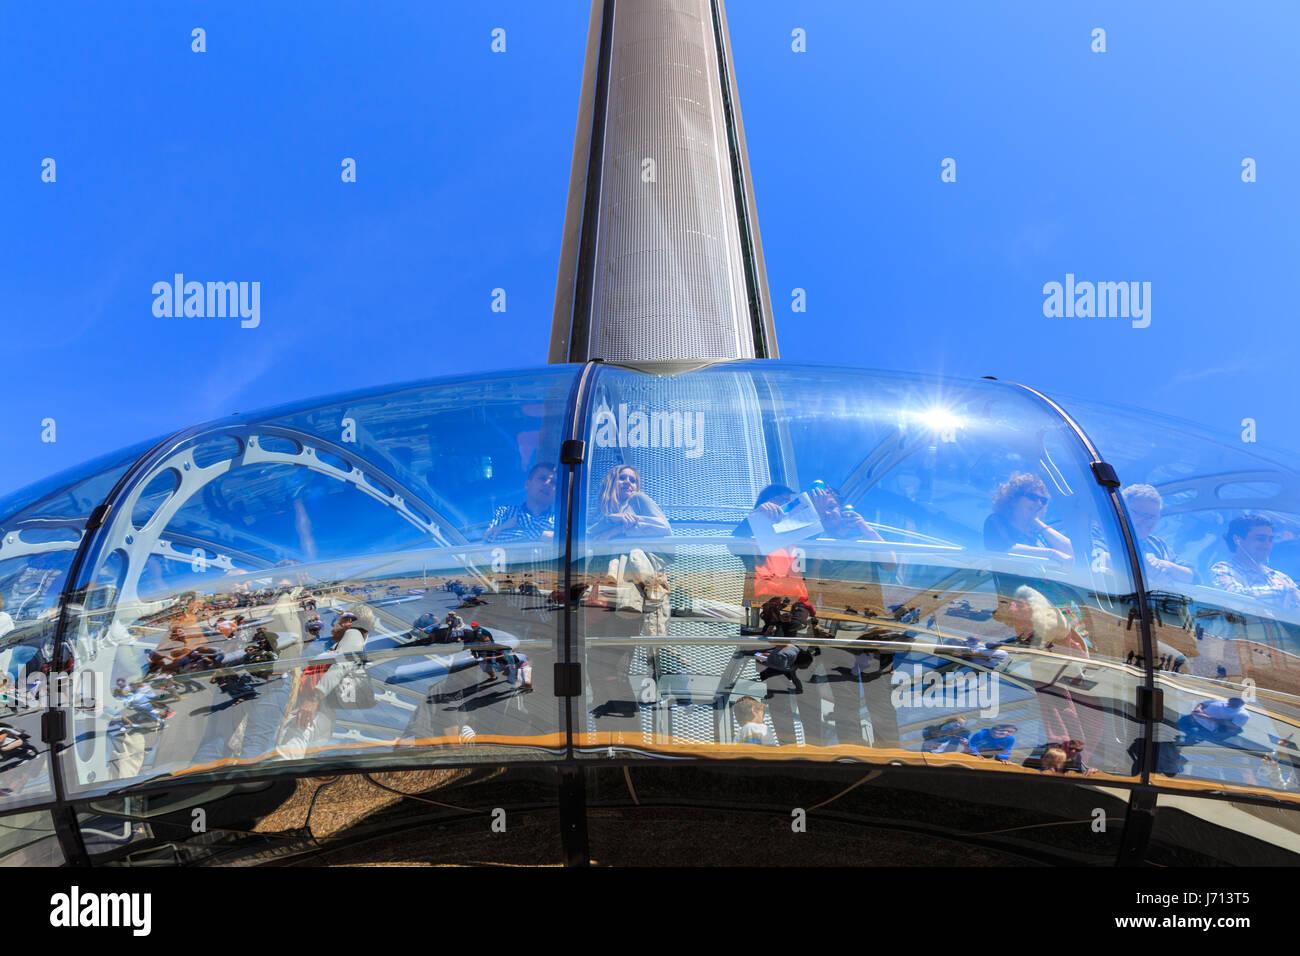 People enjoy the ride on the Brighton i360 (British Airways i360) observation tower, Brighton, UK - Stock Image